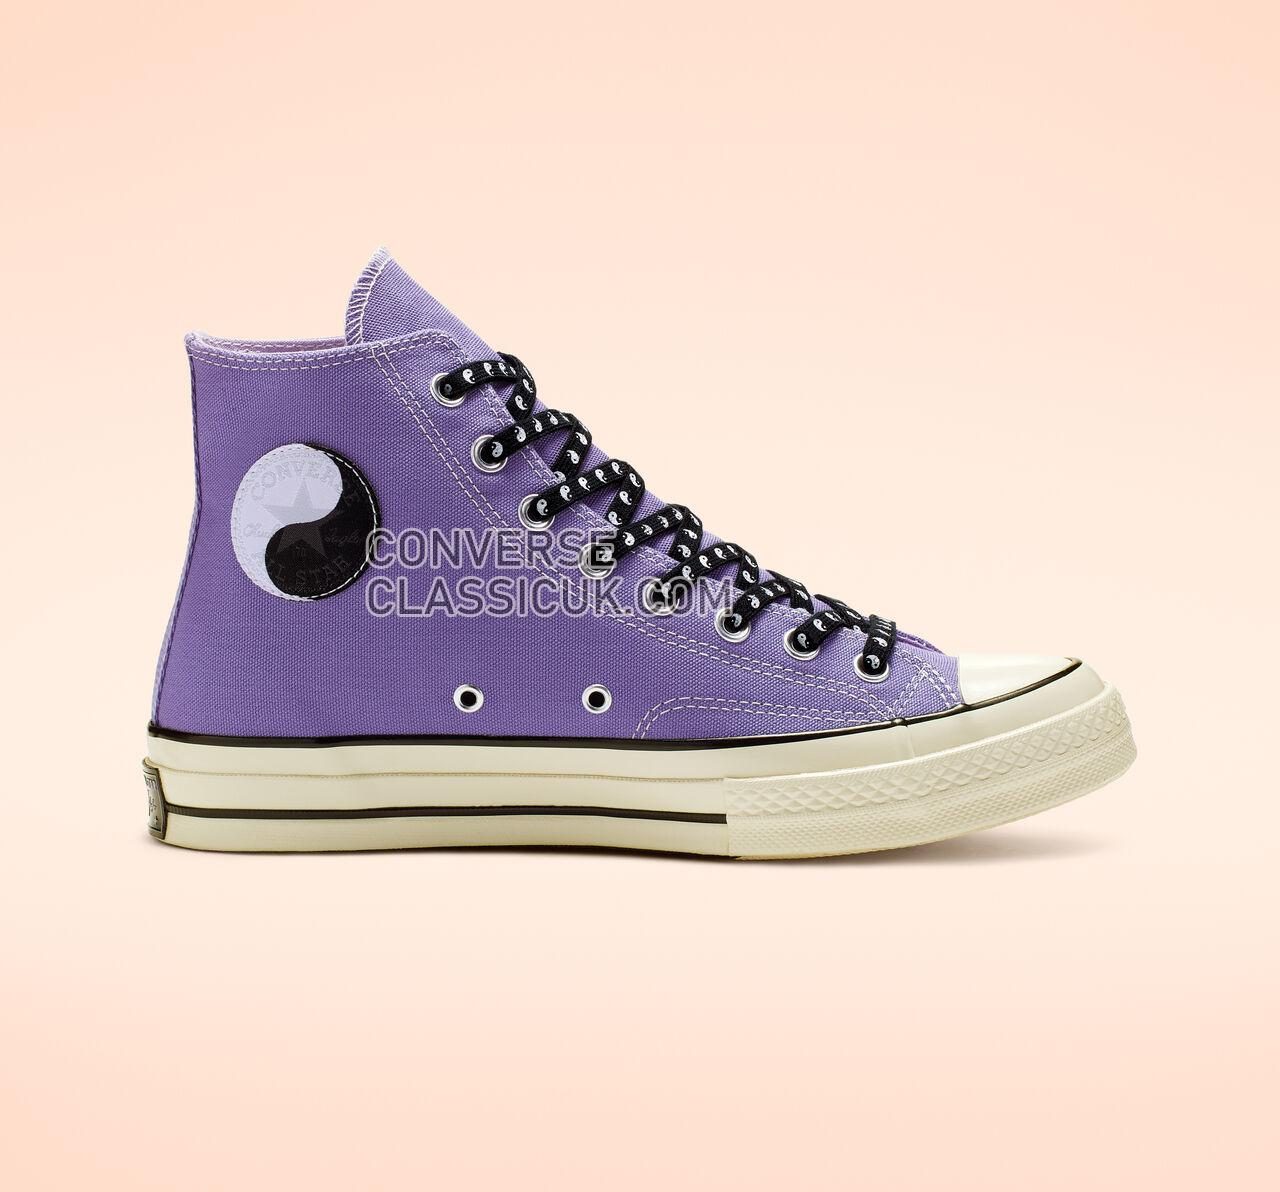 Converse Psy-Kicks Chuck 70 Womens 164211C Wild Lilac/Black/Egret Shoes